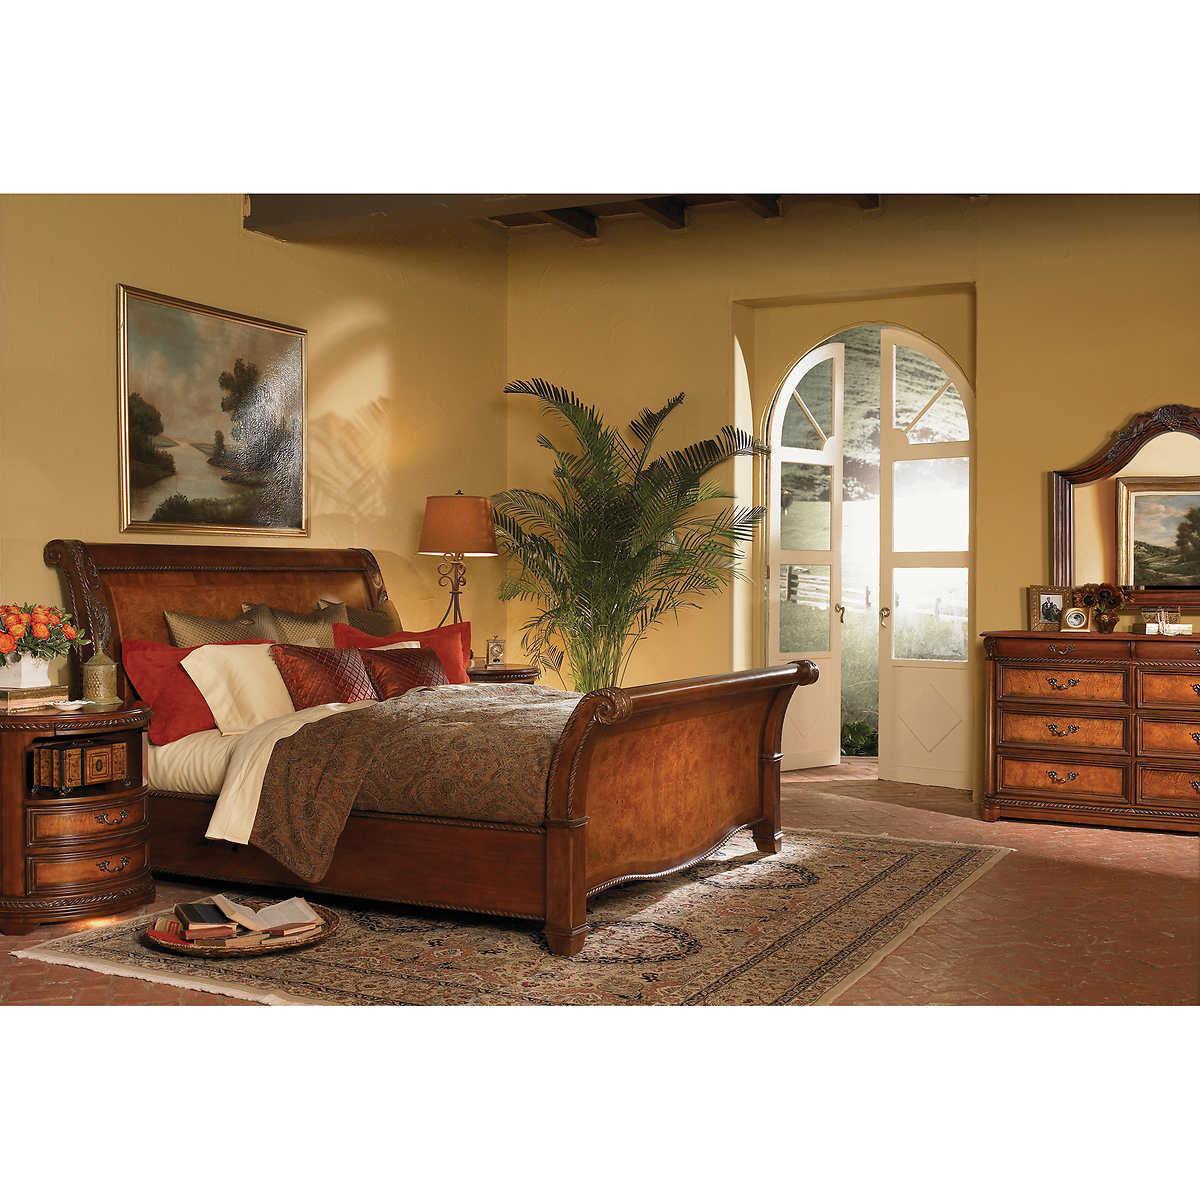 king bedroom sets | costco